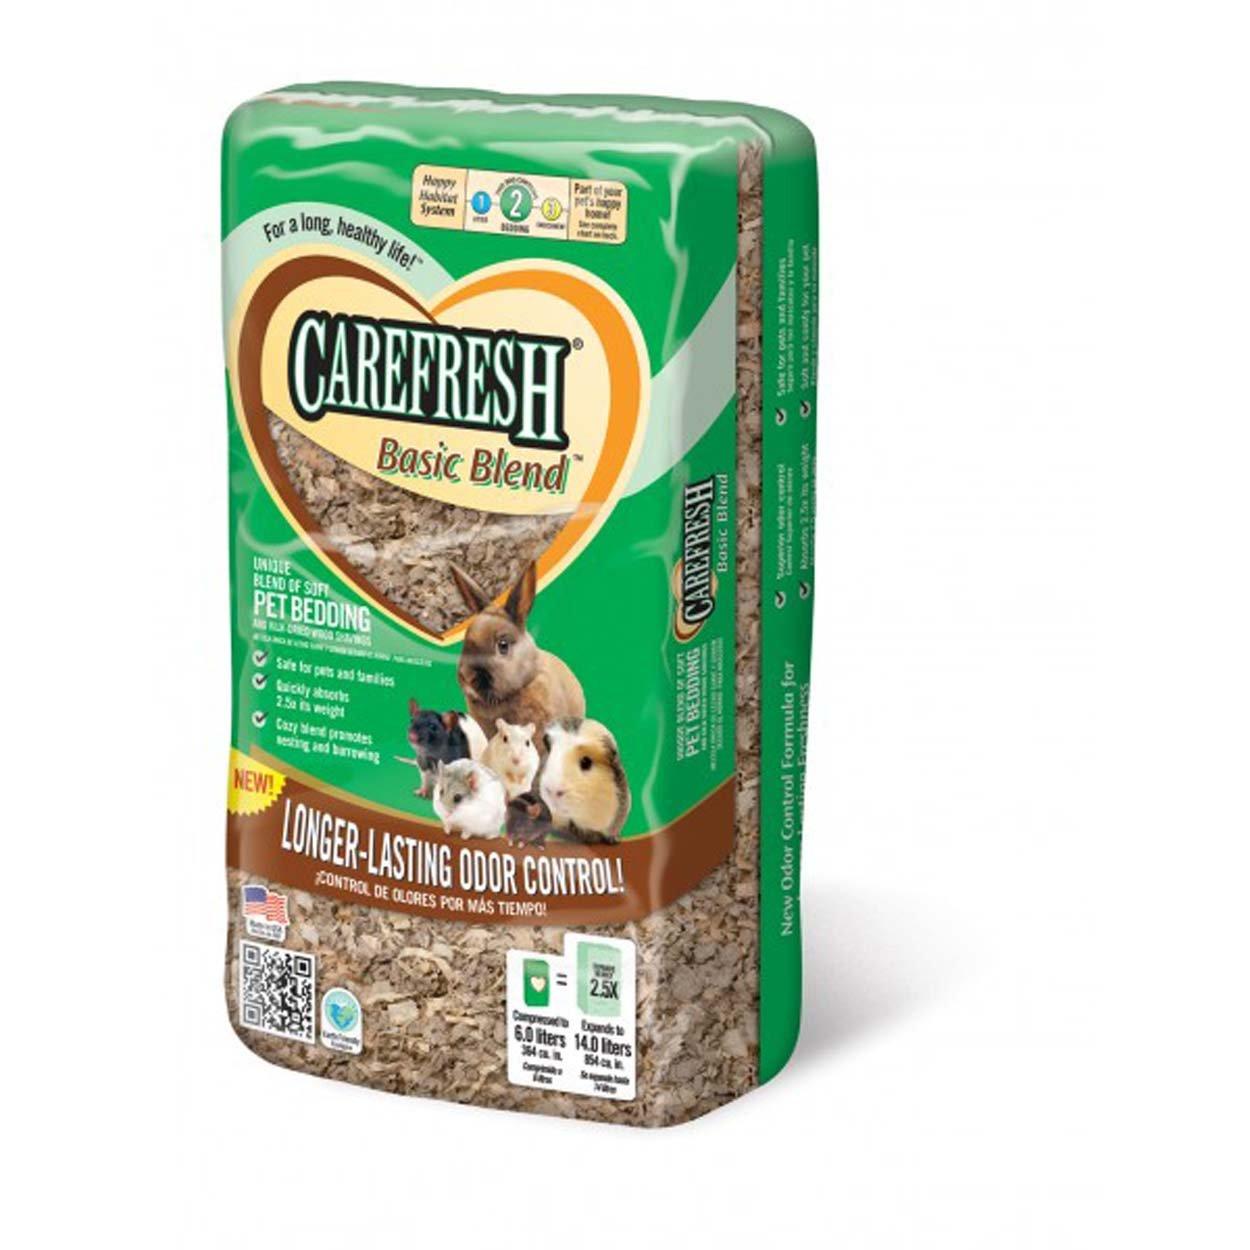 Absorbtion Corp Carefresh Basic Blend Soft Pet Bedding, 14-Liter